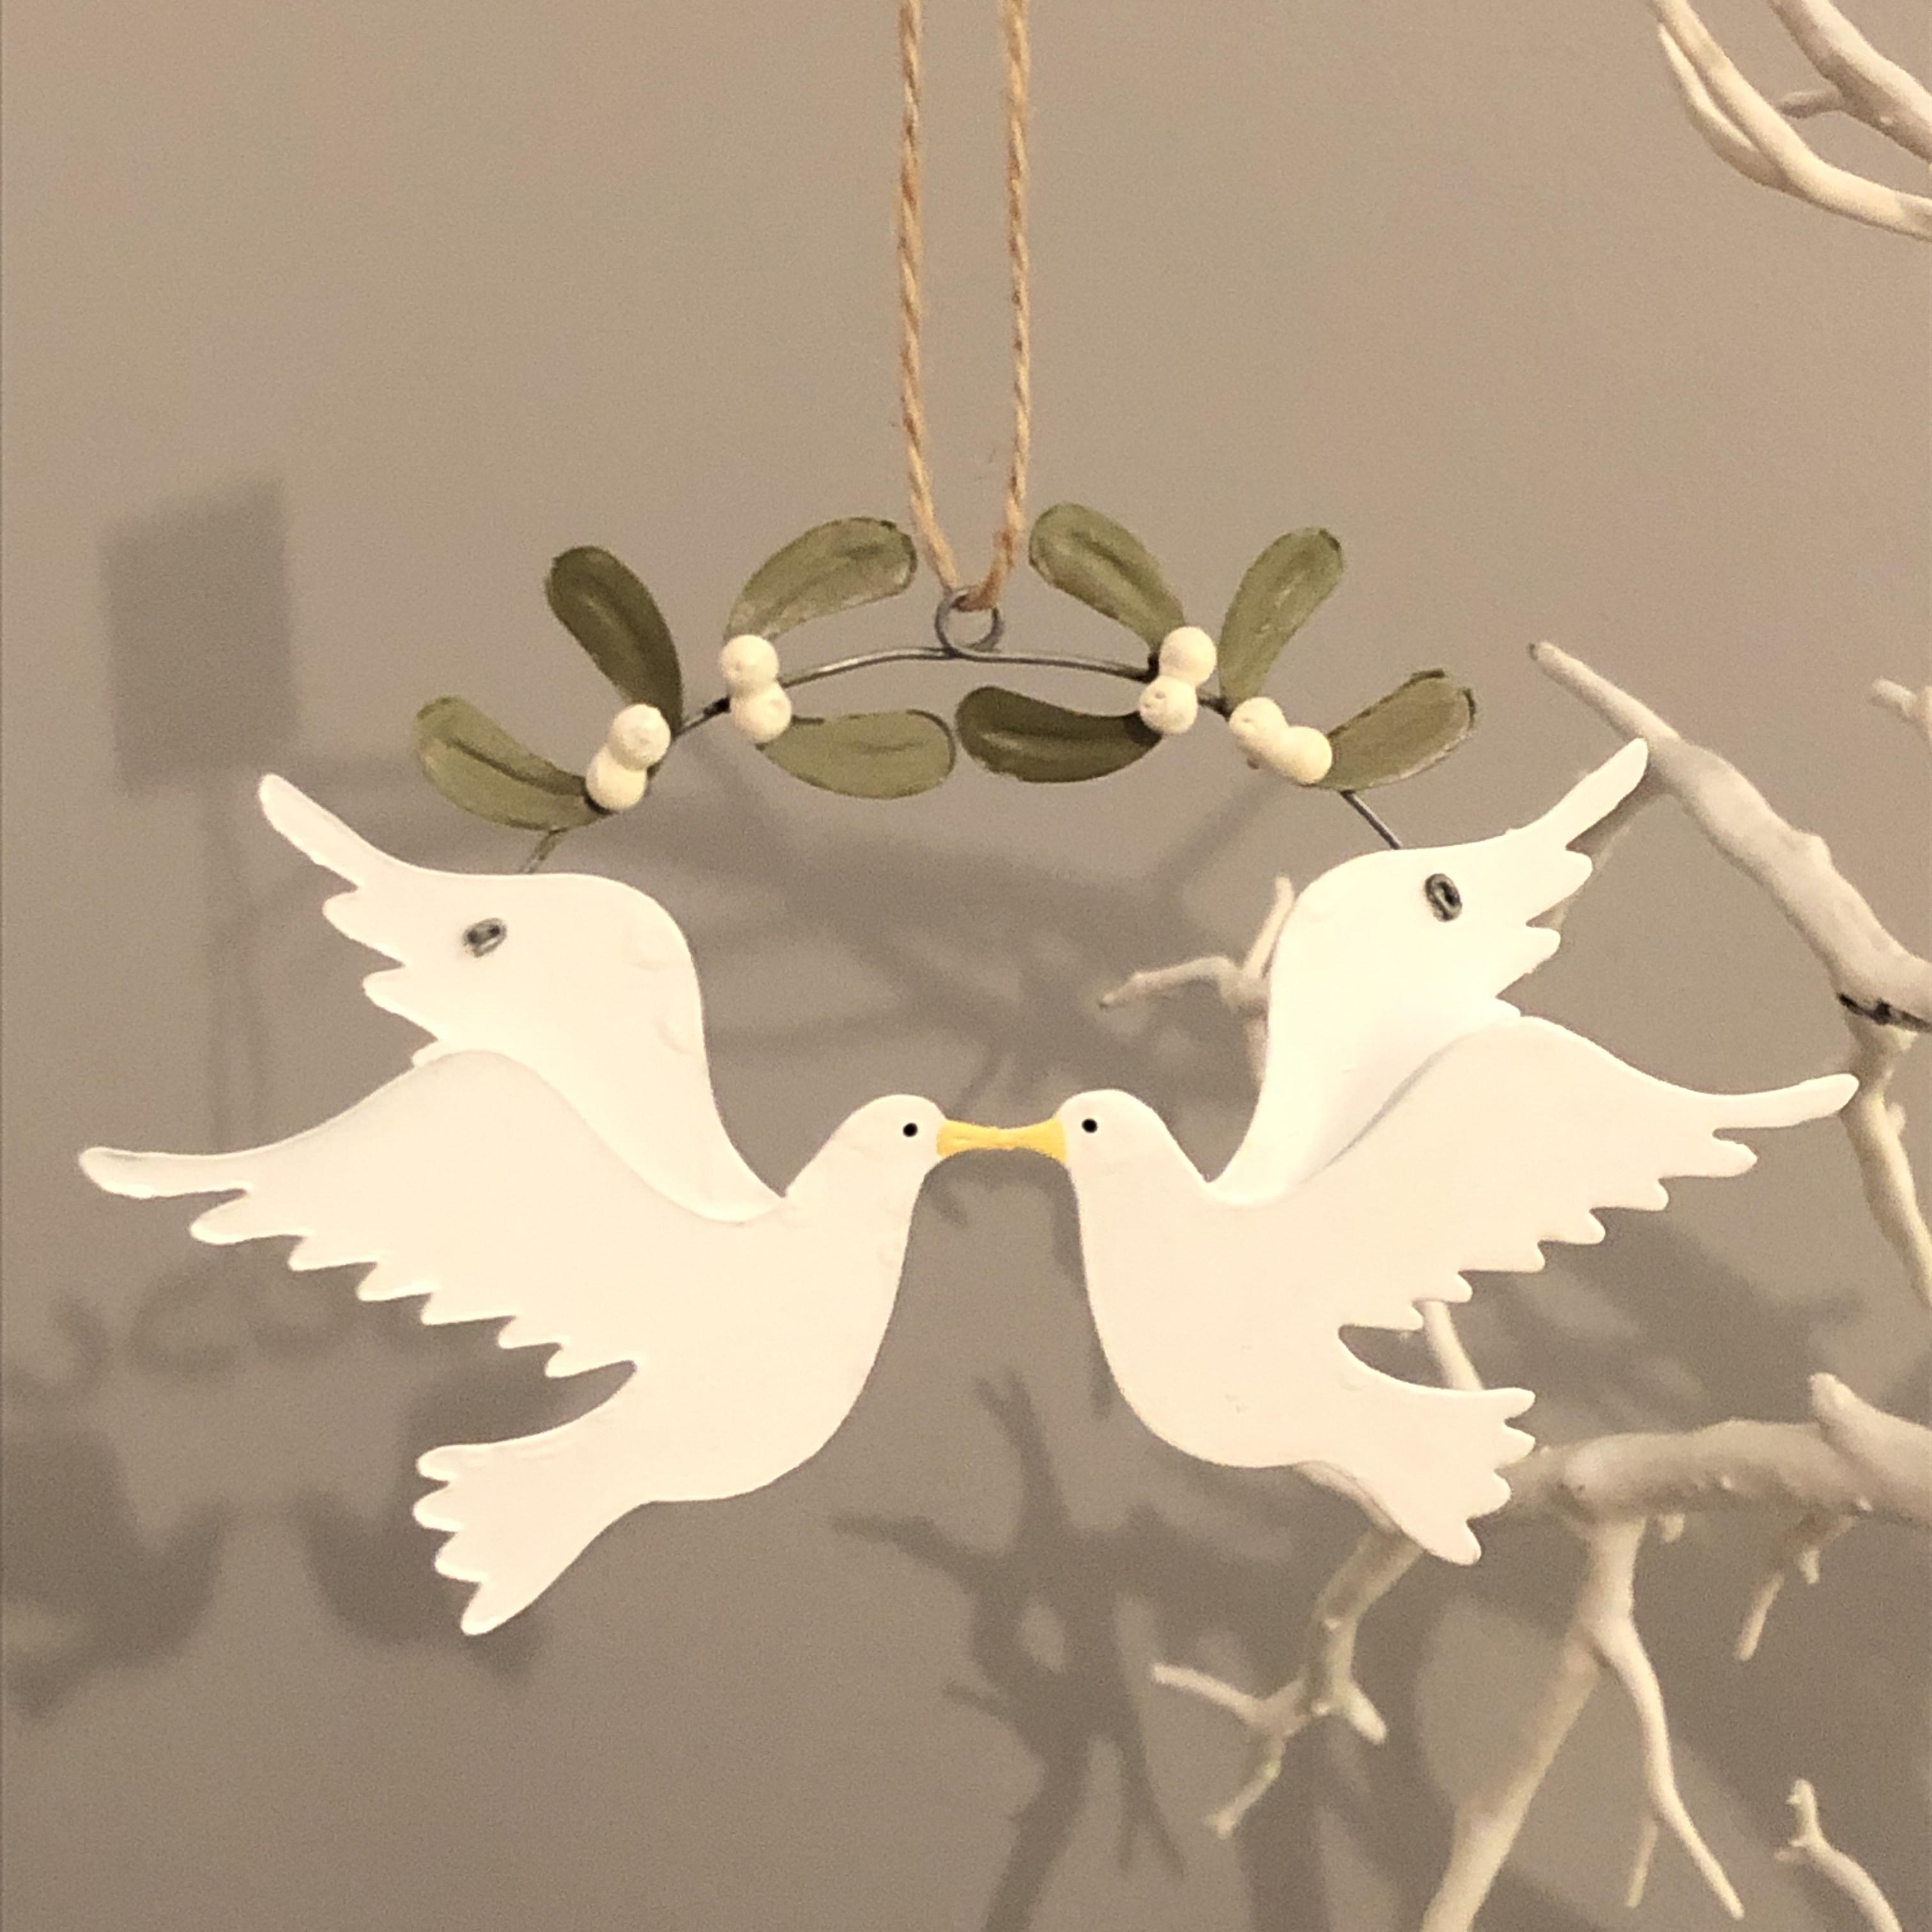 Dove couple under the mistletoe hanging decoration by shoeless joe